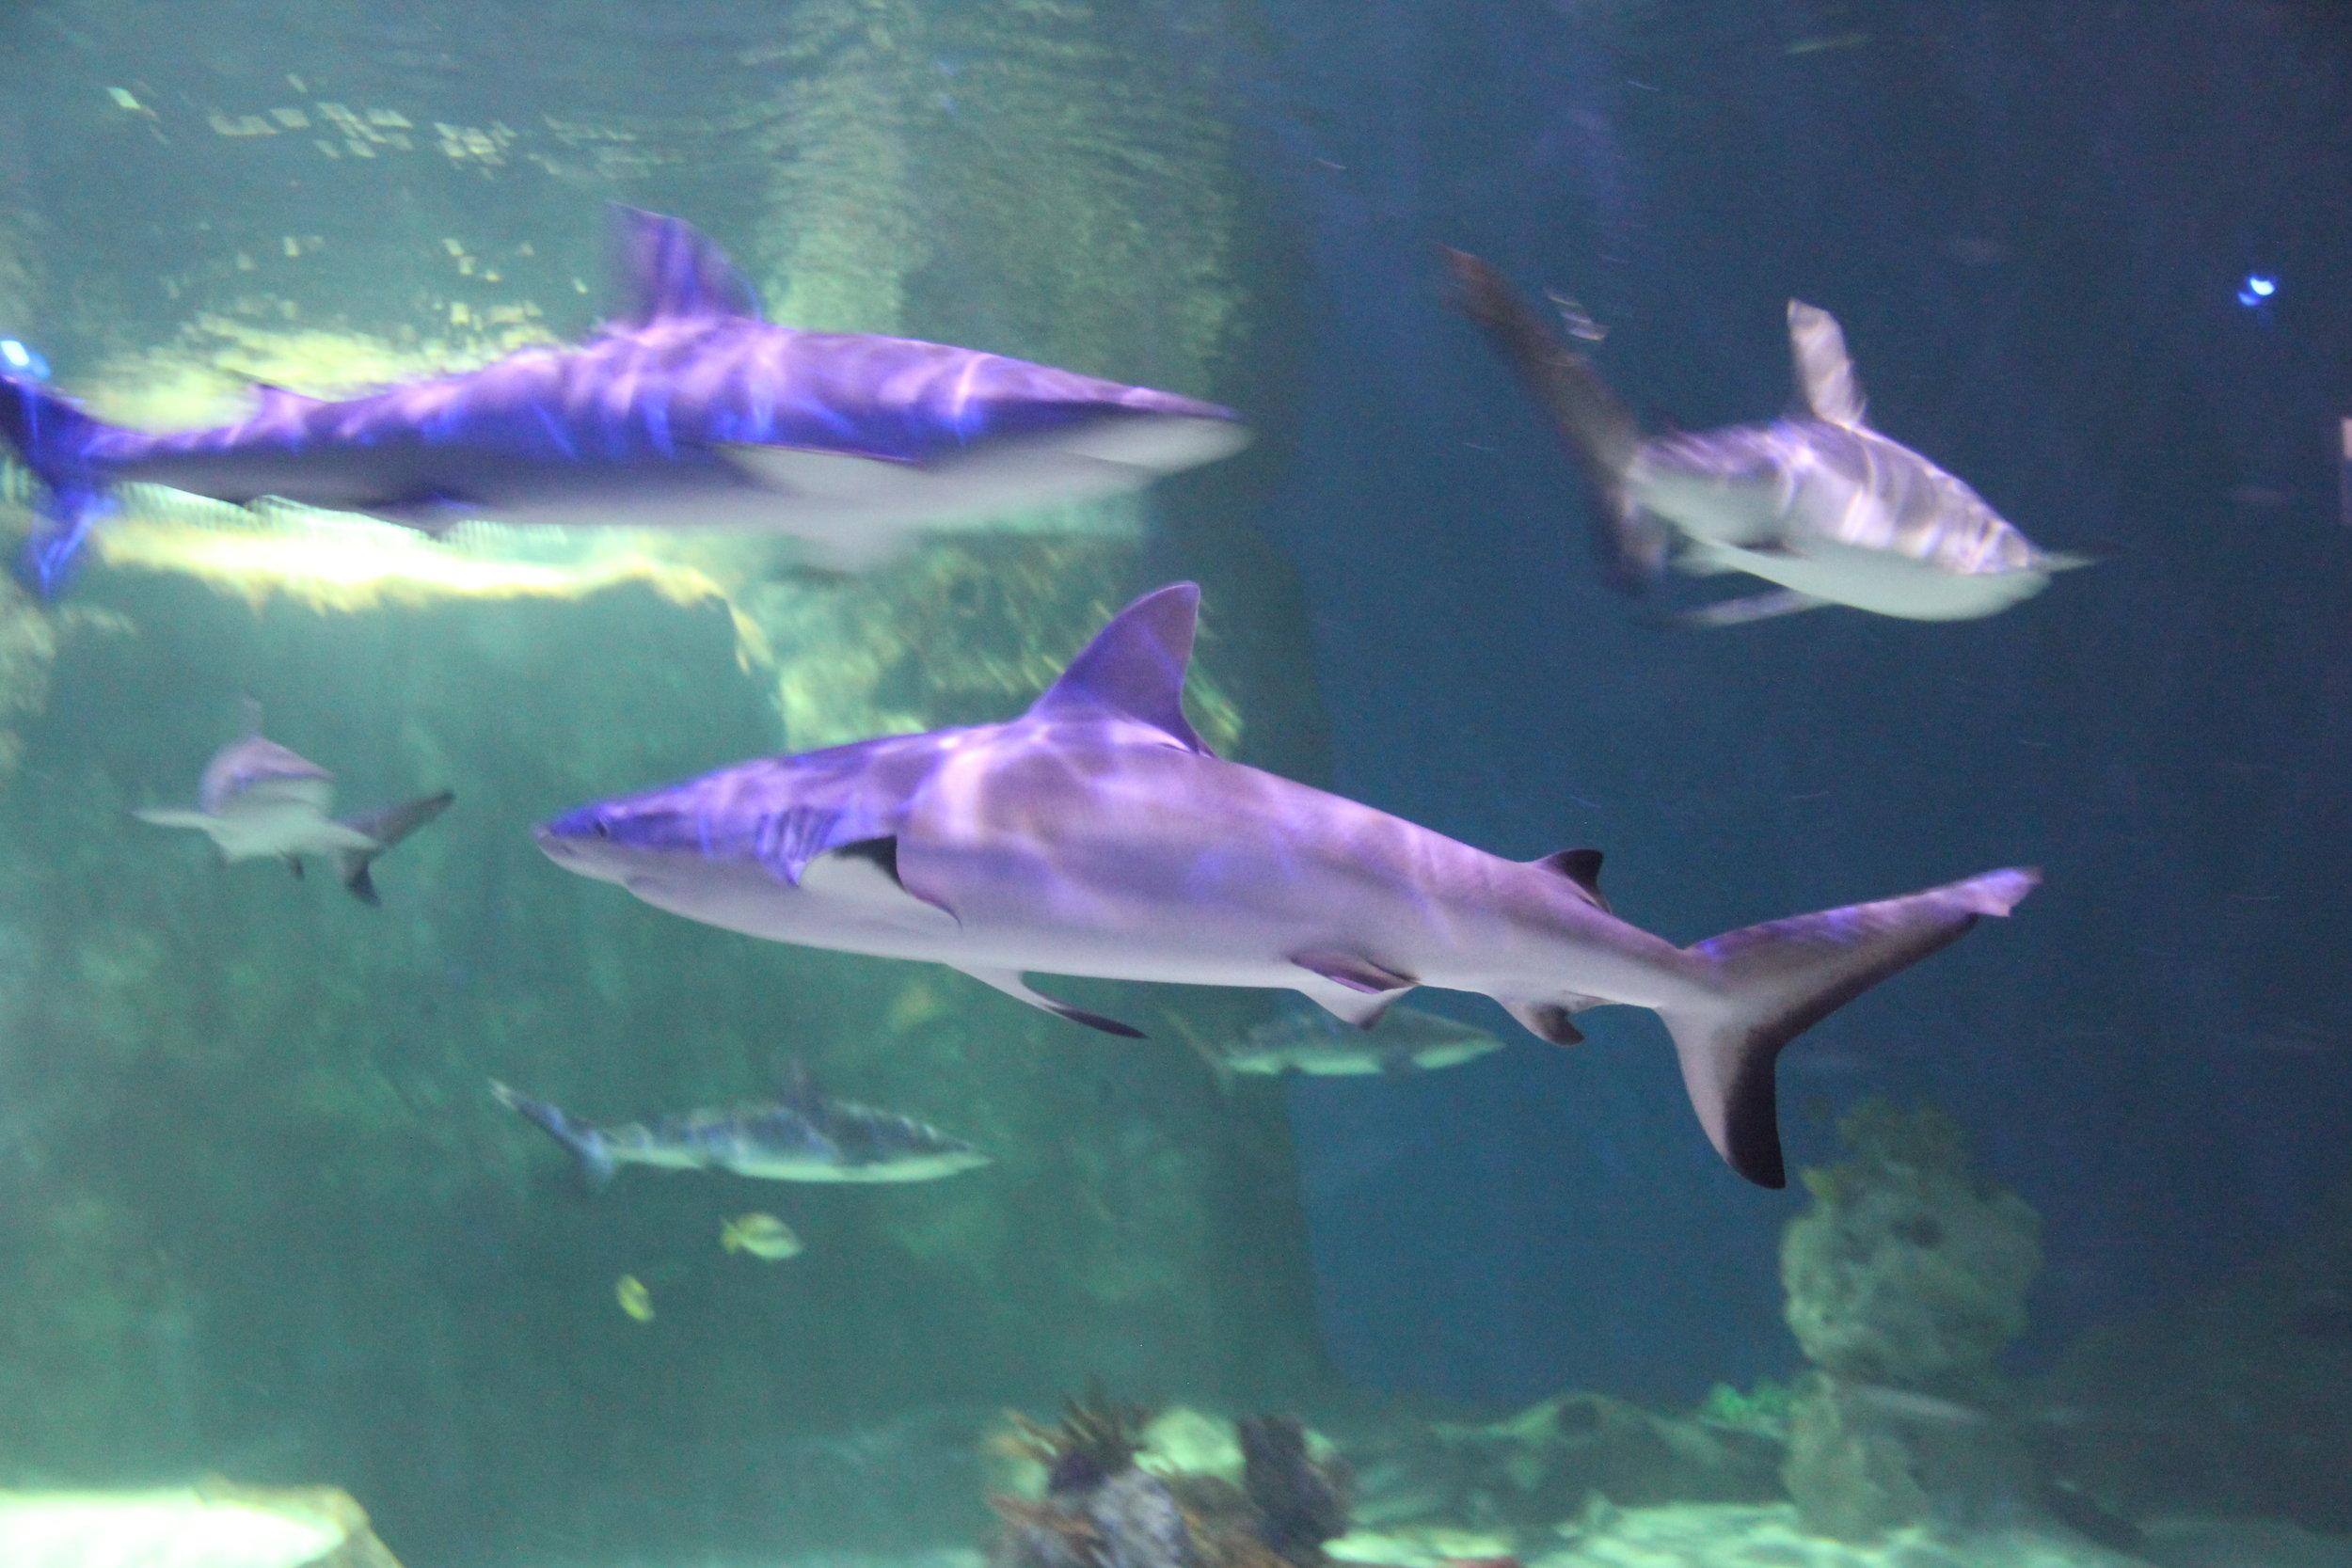 amanda jones yoga with the sharks utah